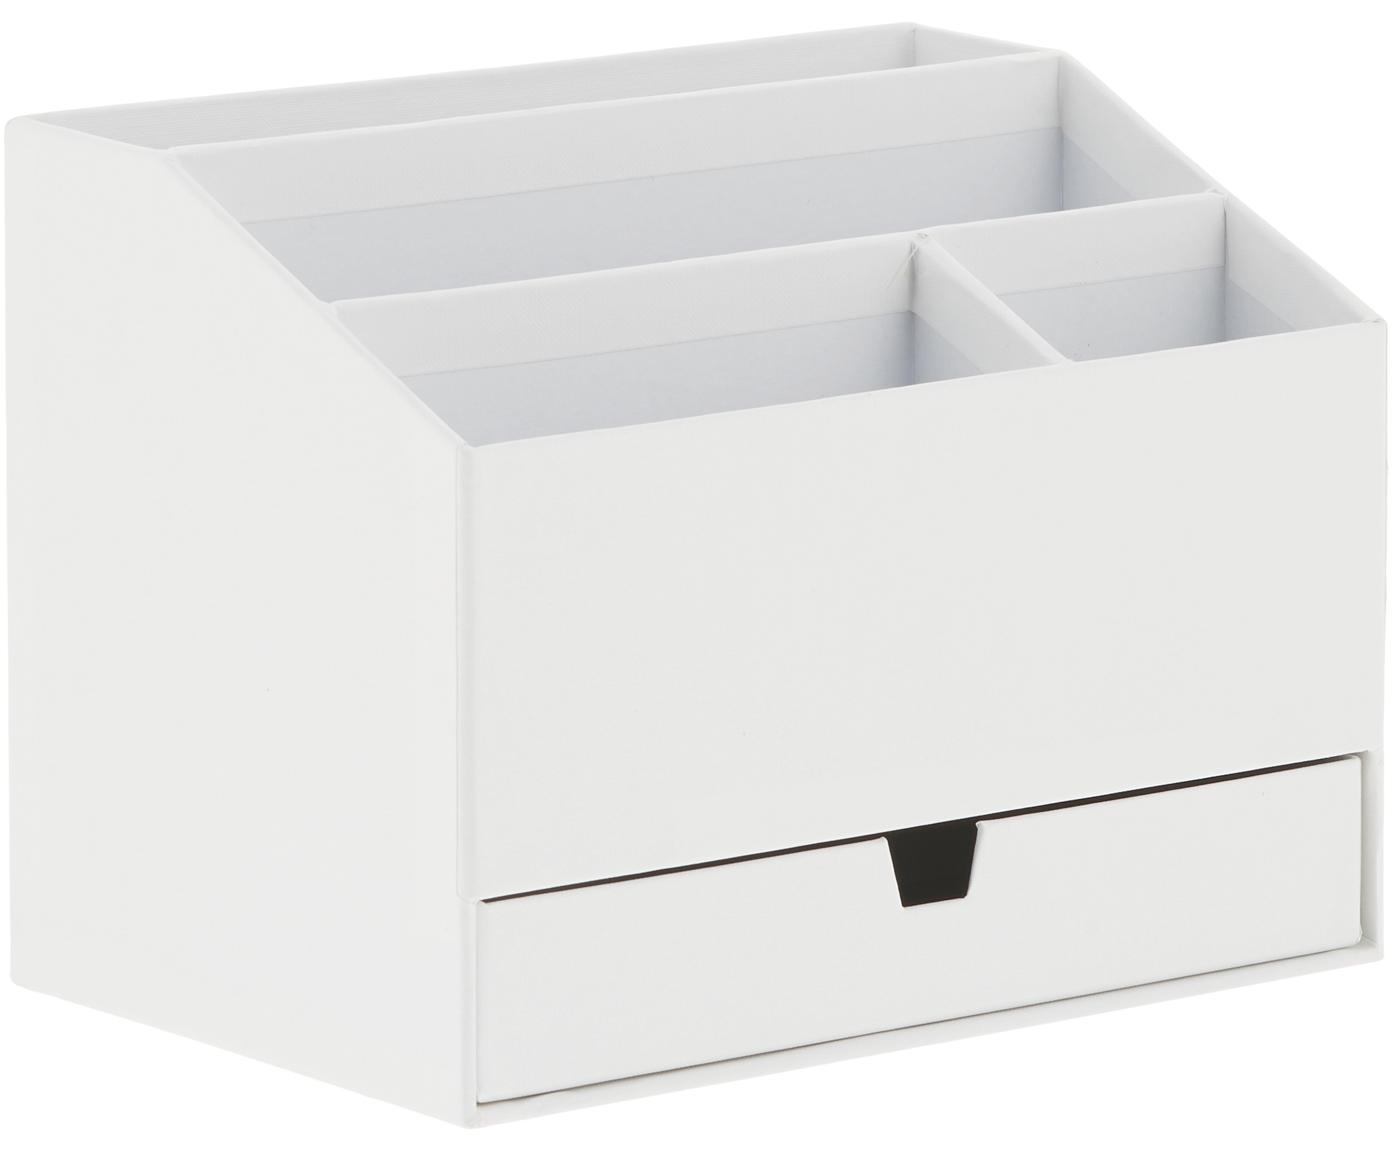 Bureau organizer Greta, Massief, gelamineerd karton, Wit, 24 x 18 cm